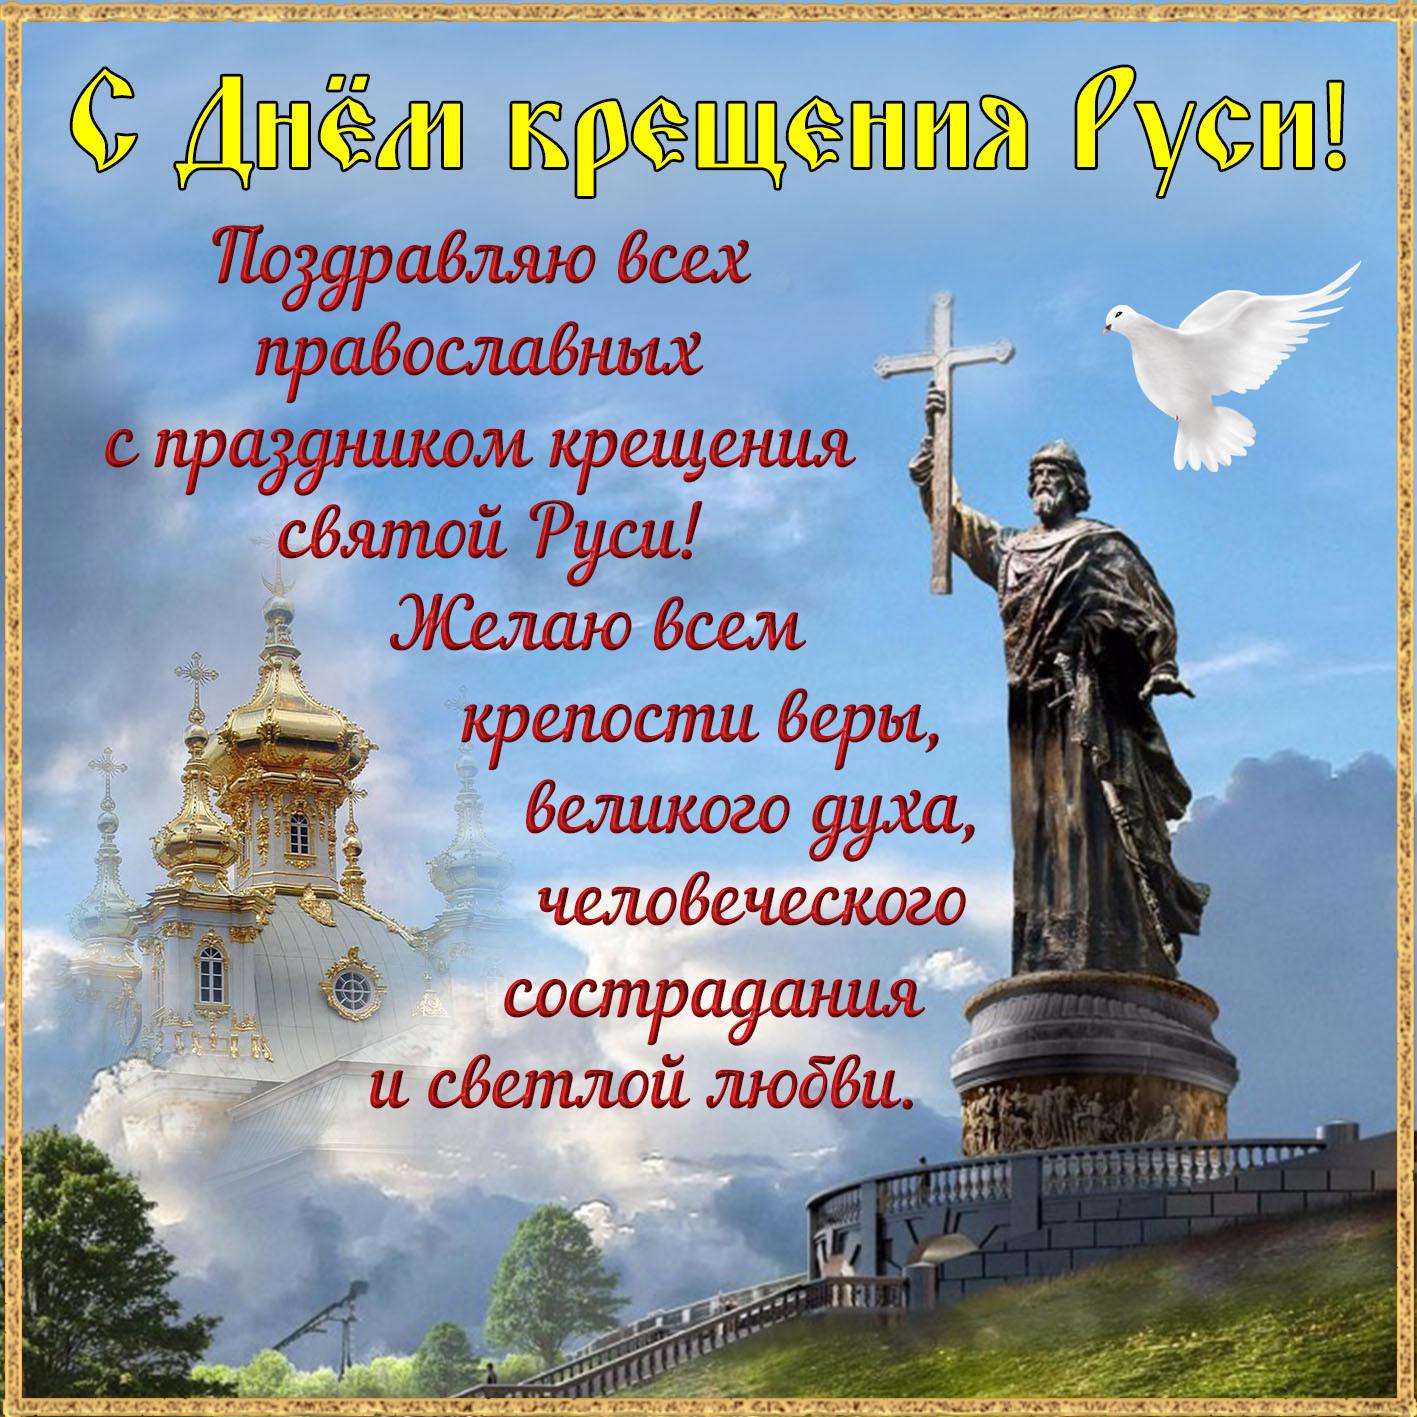 Открытки с днем князя владимира